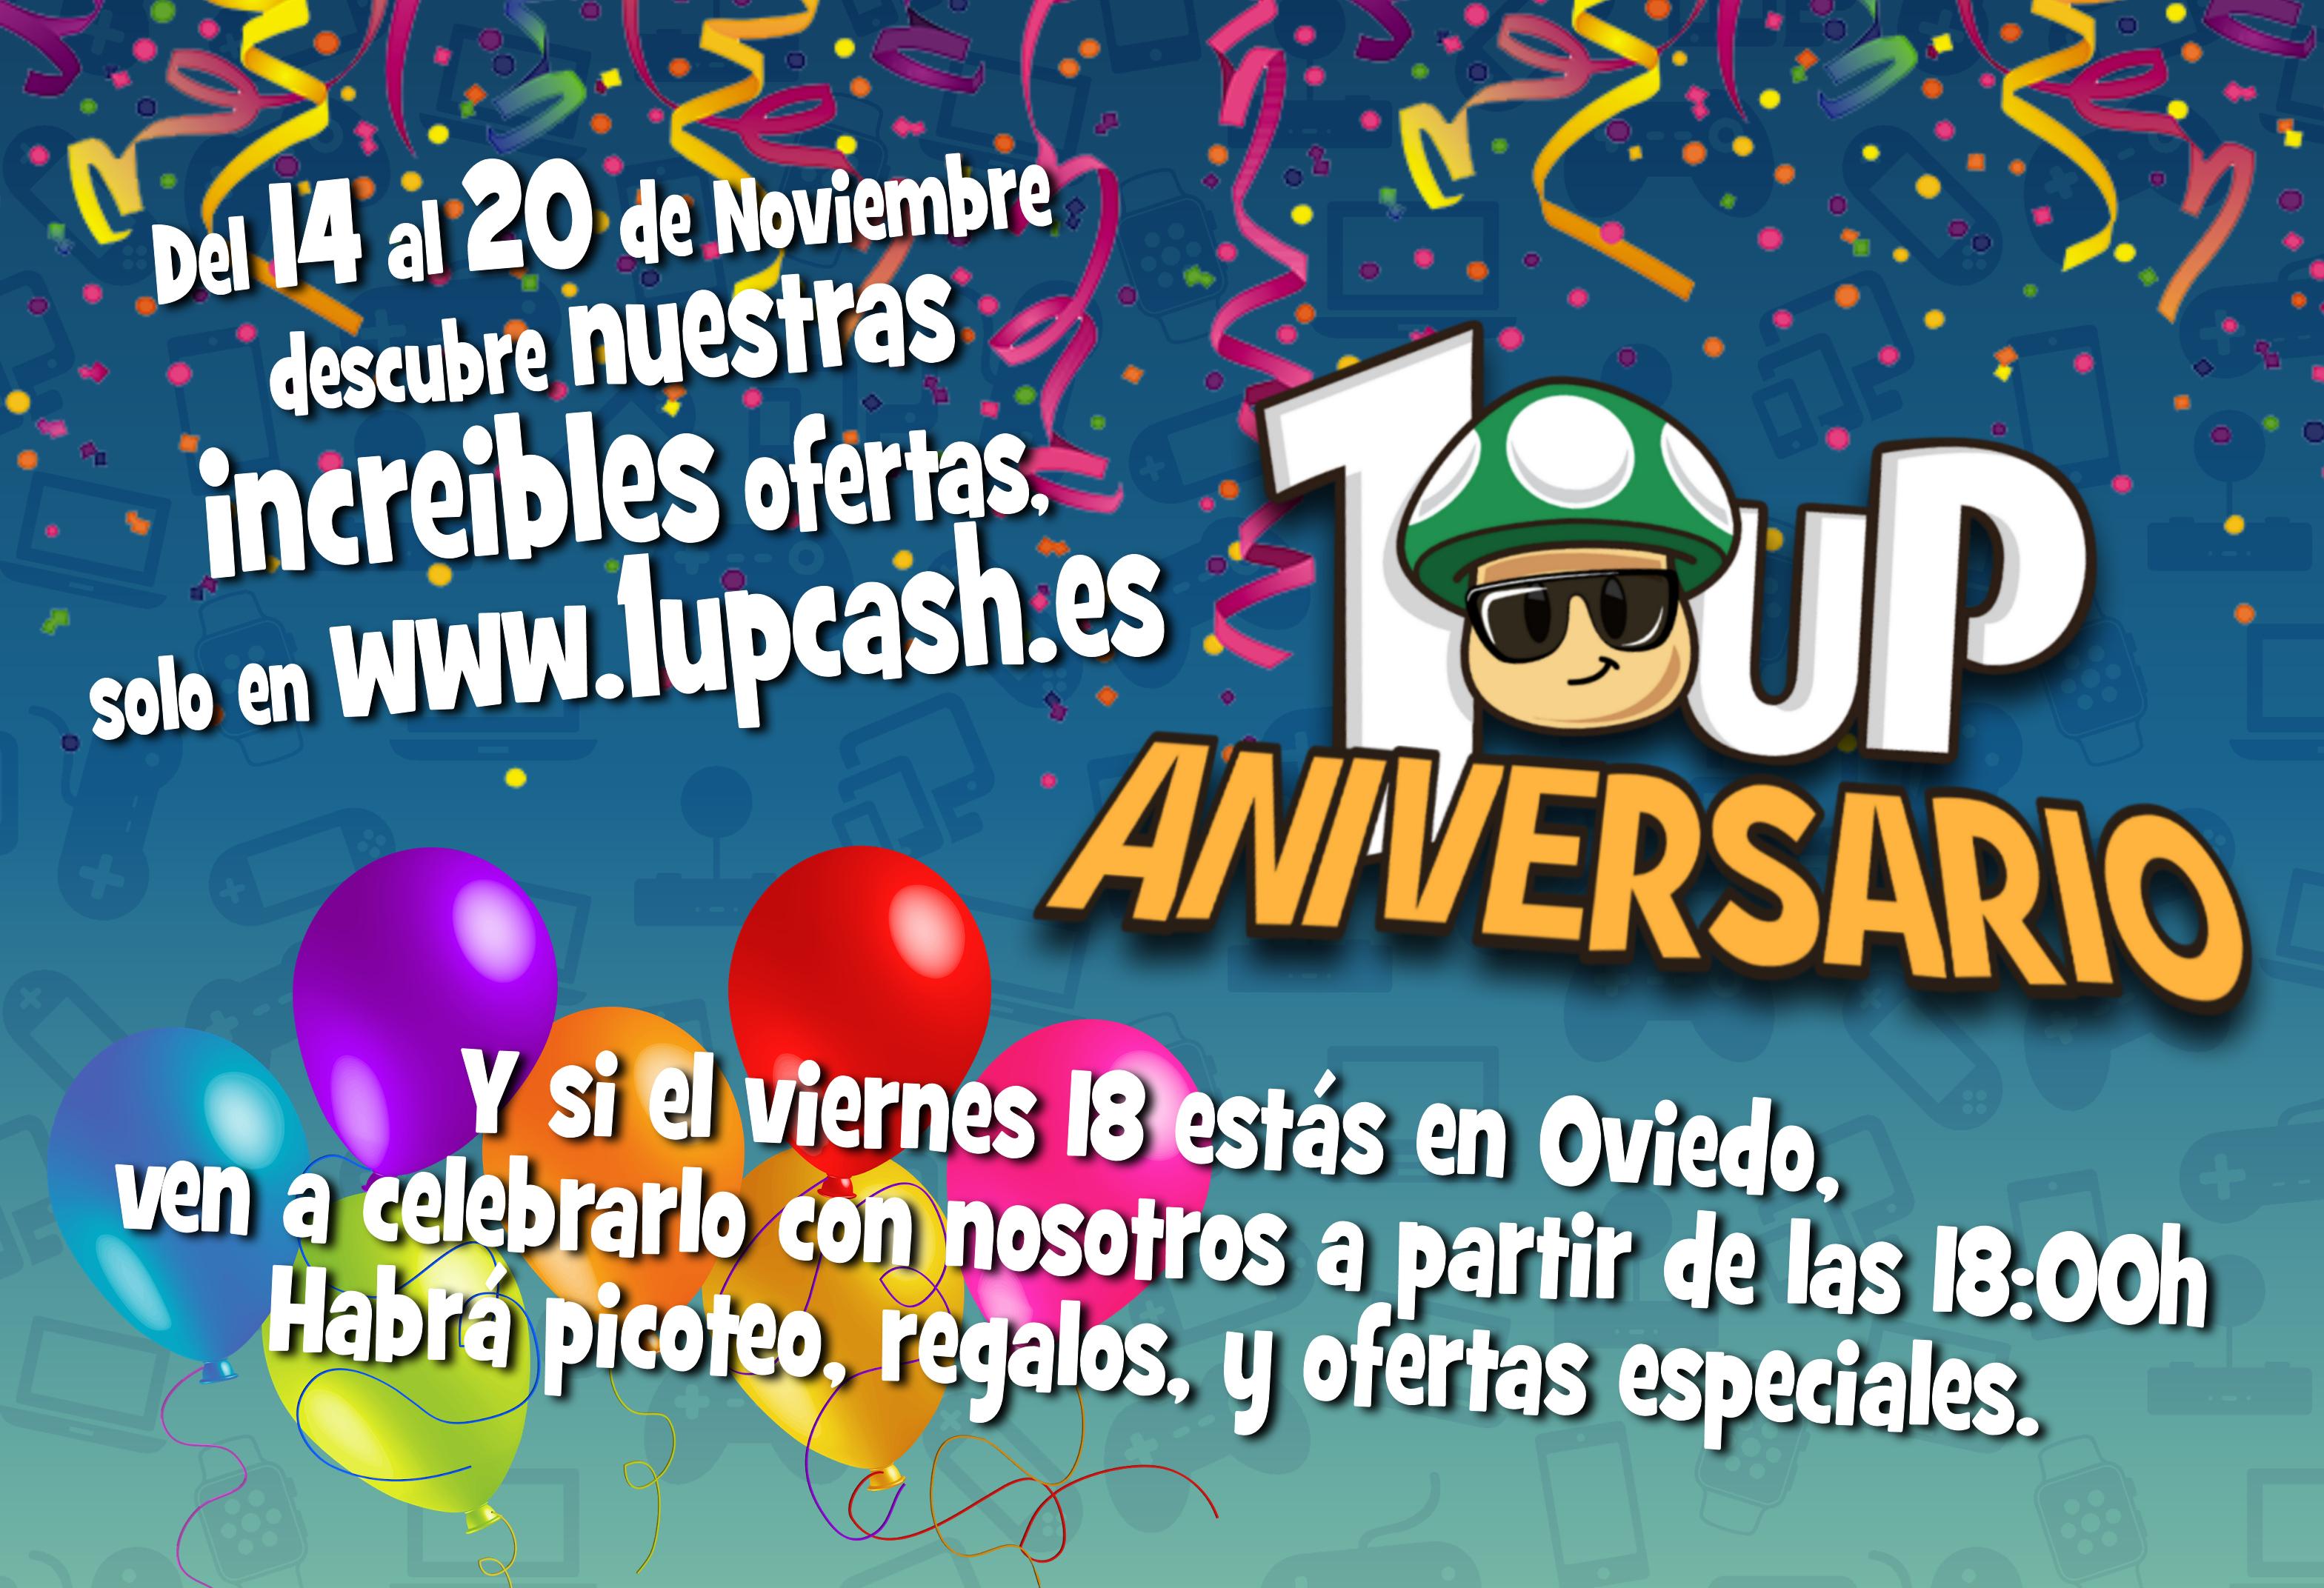 1up_1_aniversario